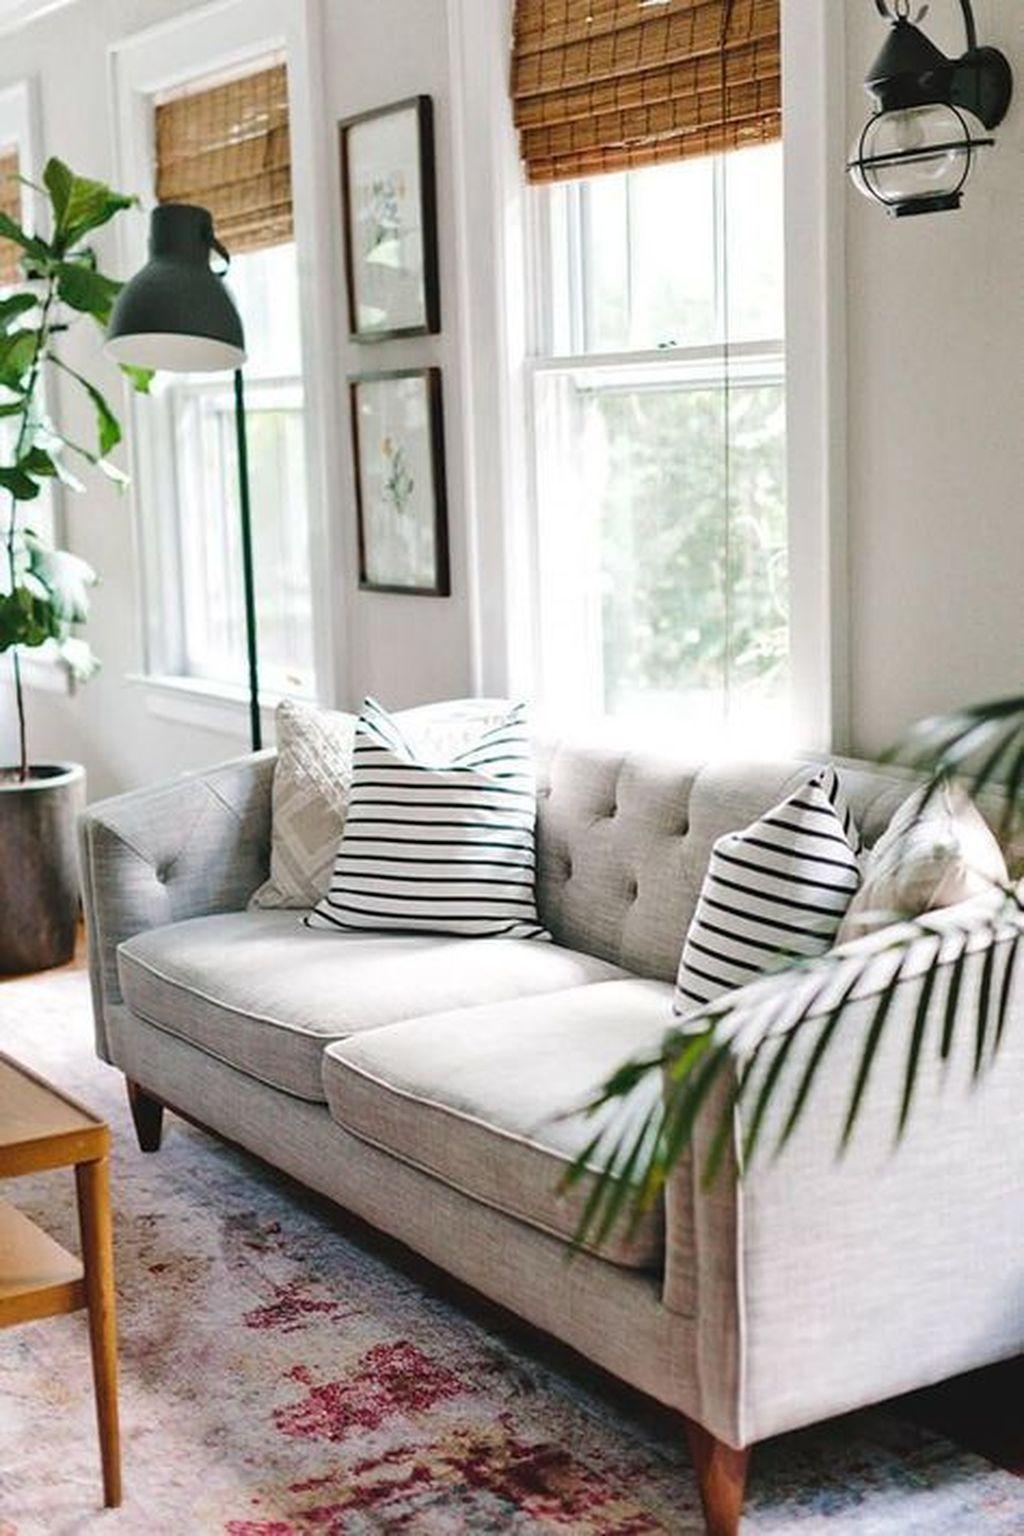 20 Cozy Apartment Living Room Decoration Ideas